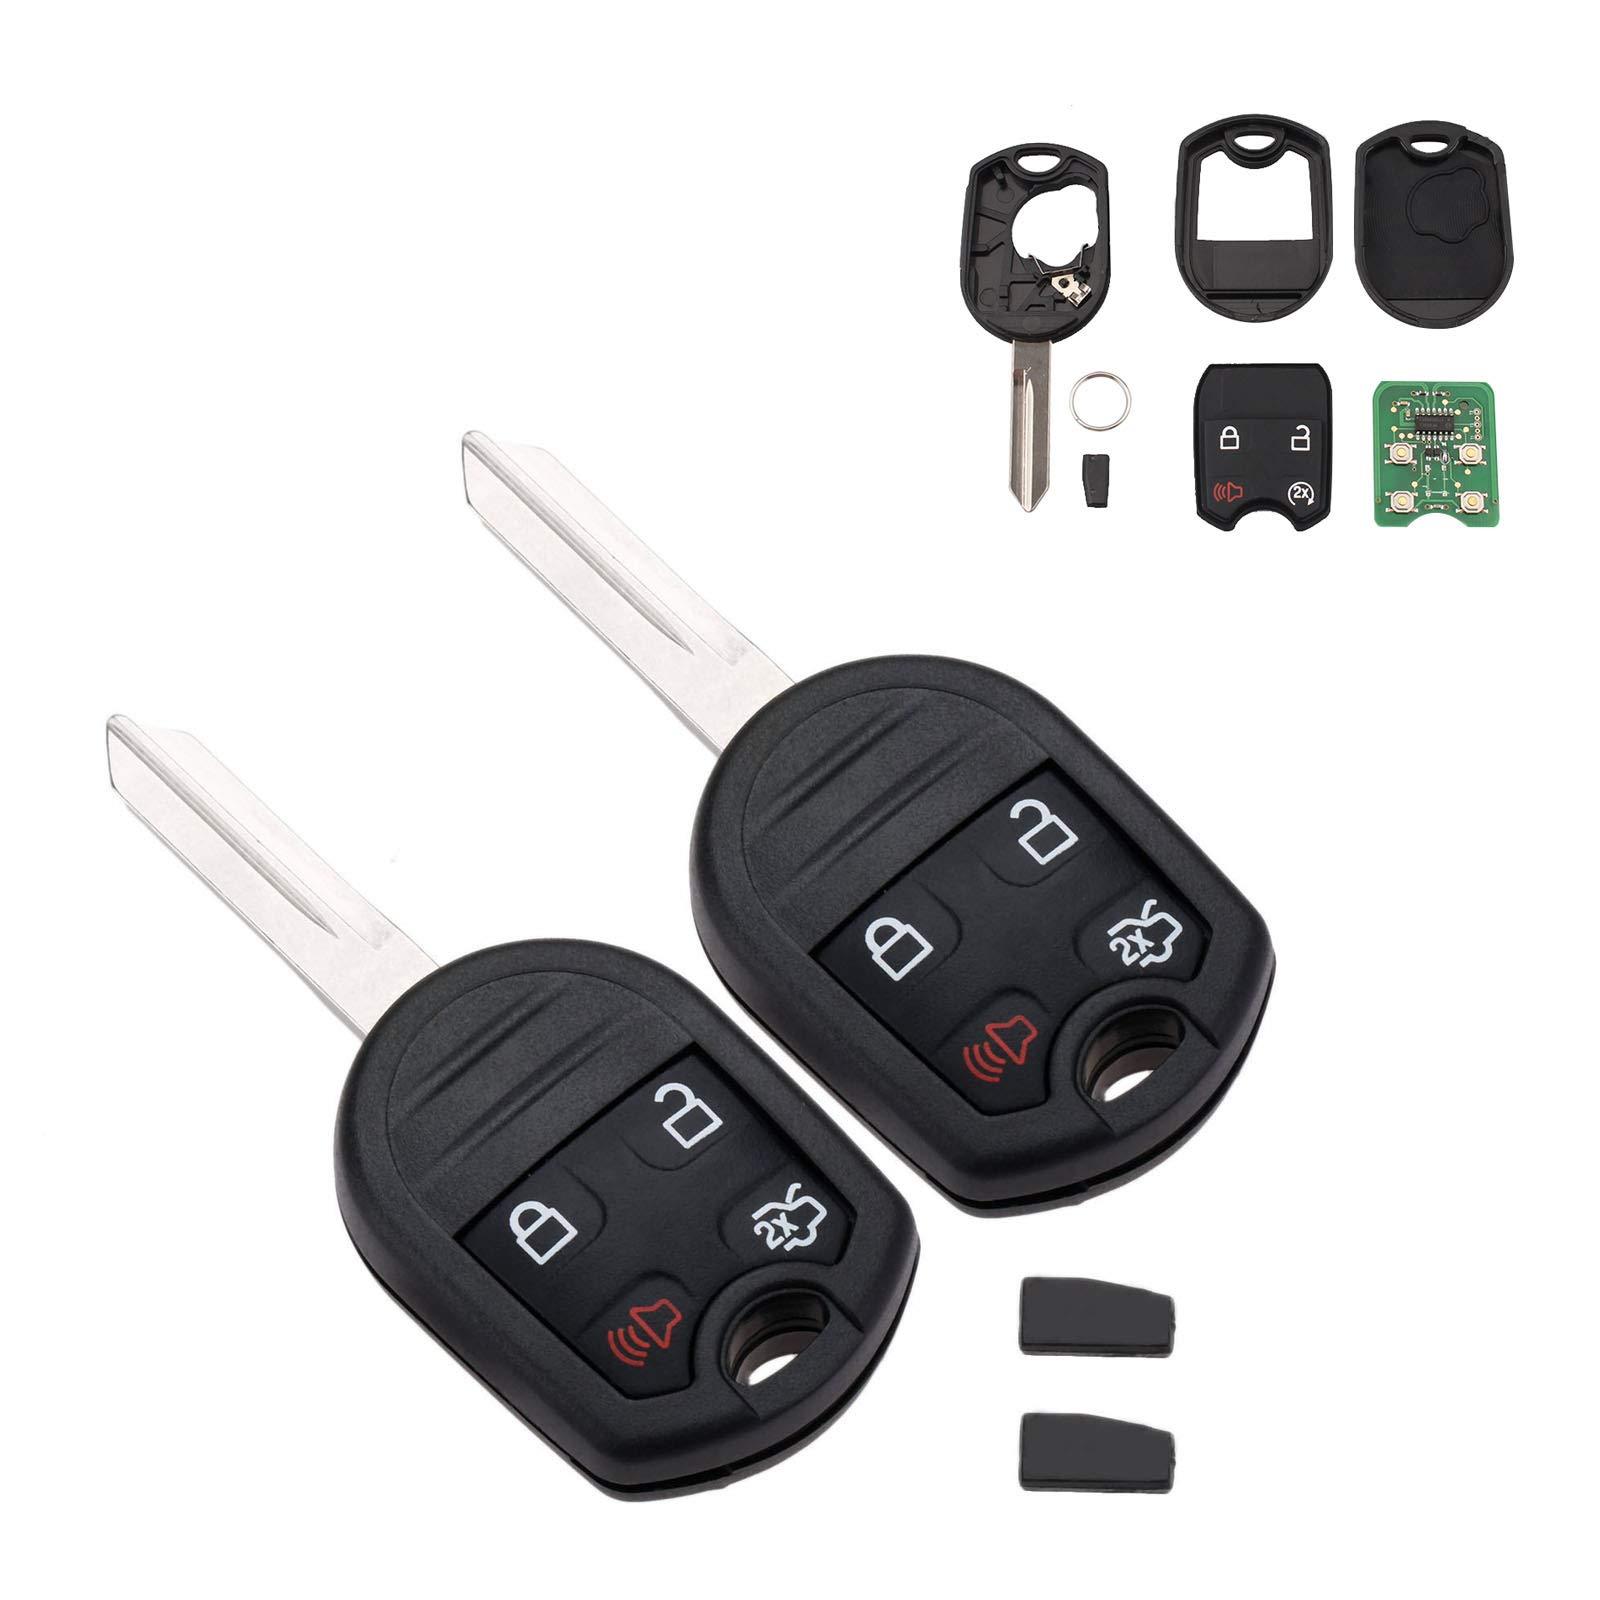 2 PC Car Key Fob Keyless Entry Remote Start, CWTWB1U793 4 Buttons 315 MHz  Car Remote Key Fit for Ford 11-16 F150 250 350 450 Explorer